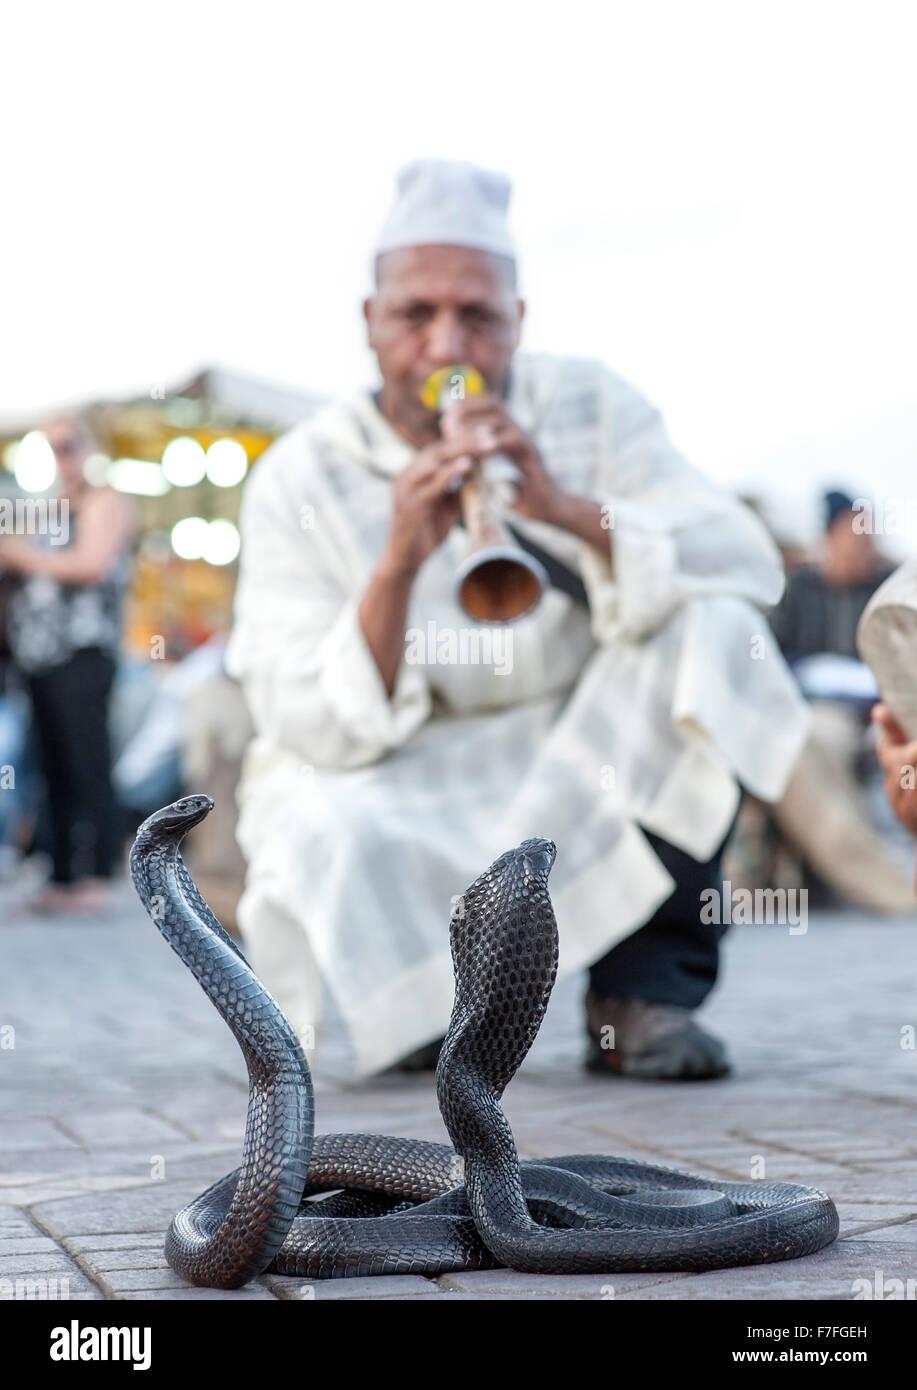 Snake charmer and cobras in Jemaa El Fna Square in Marrakech, Morocco. - Stock Image